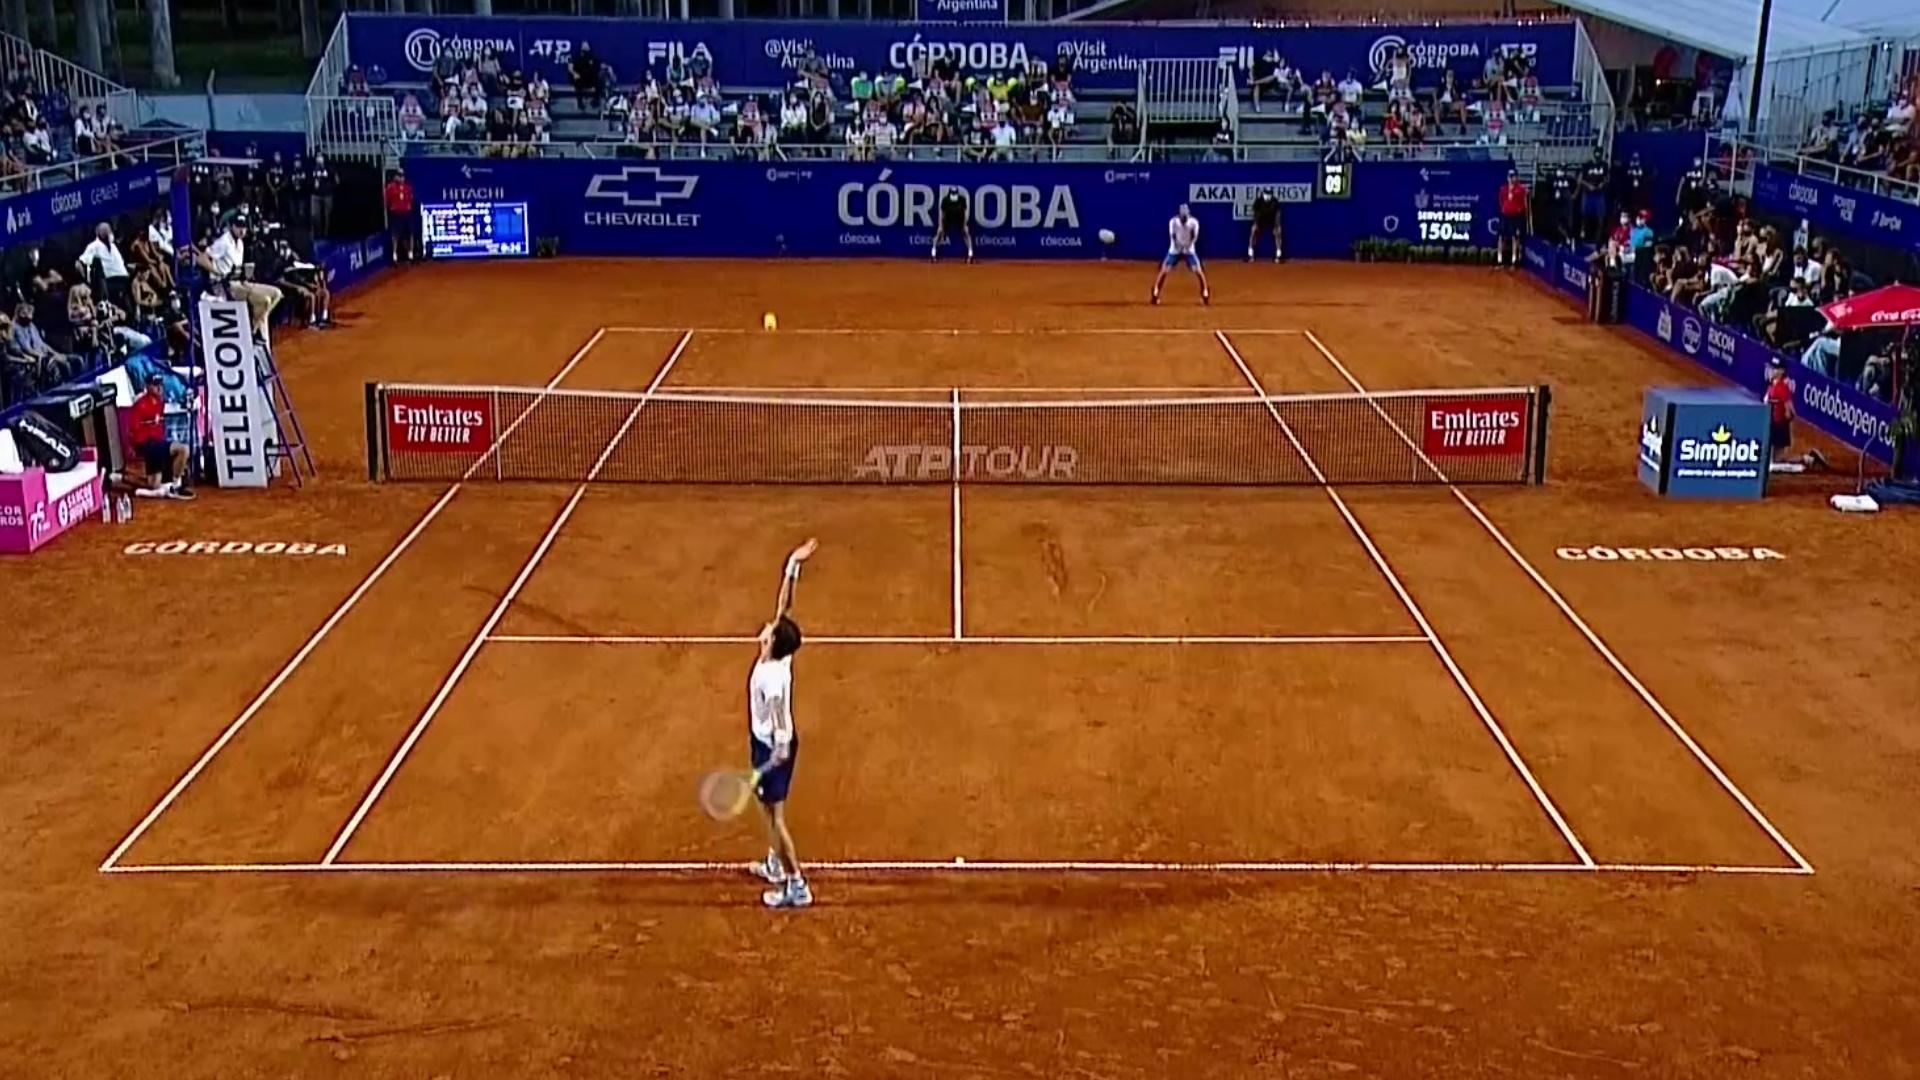 ATP 250 Torneo Córdoba. Final: A. Ramos - J.Cerúndolo